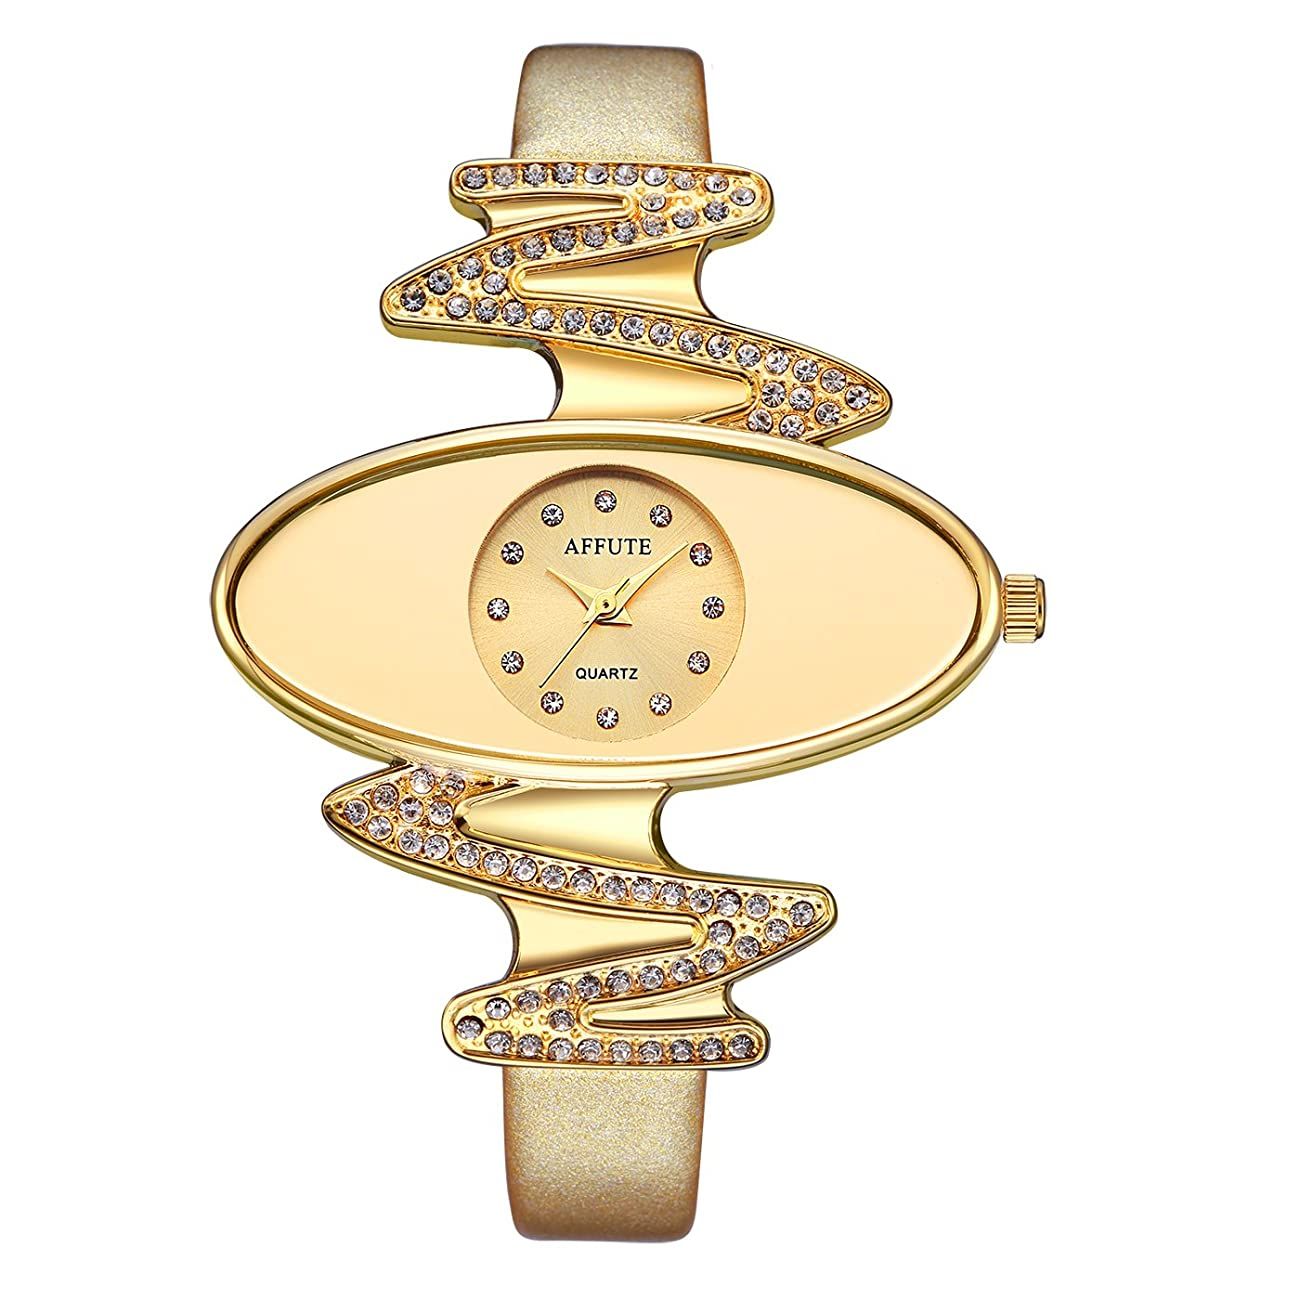 Retro Gold Leather Strap Brand Women Watch Strass Rhinestone Jewelry Quartz Wrist Watches 0